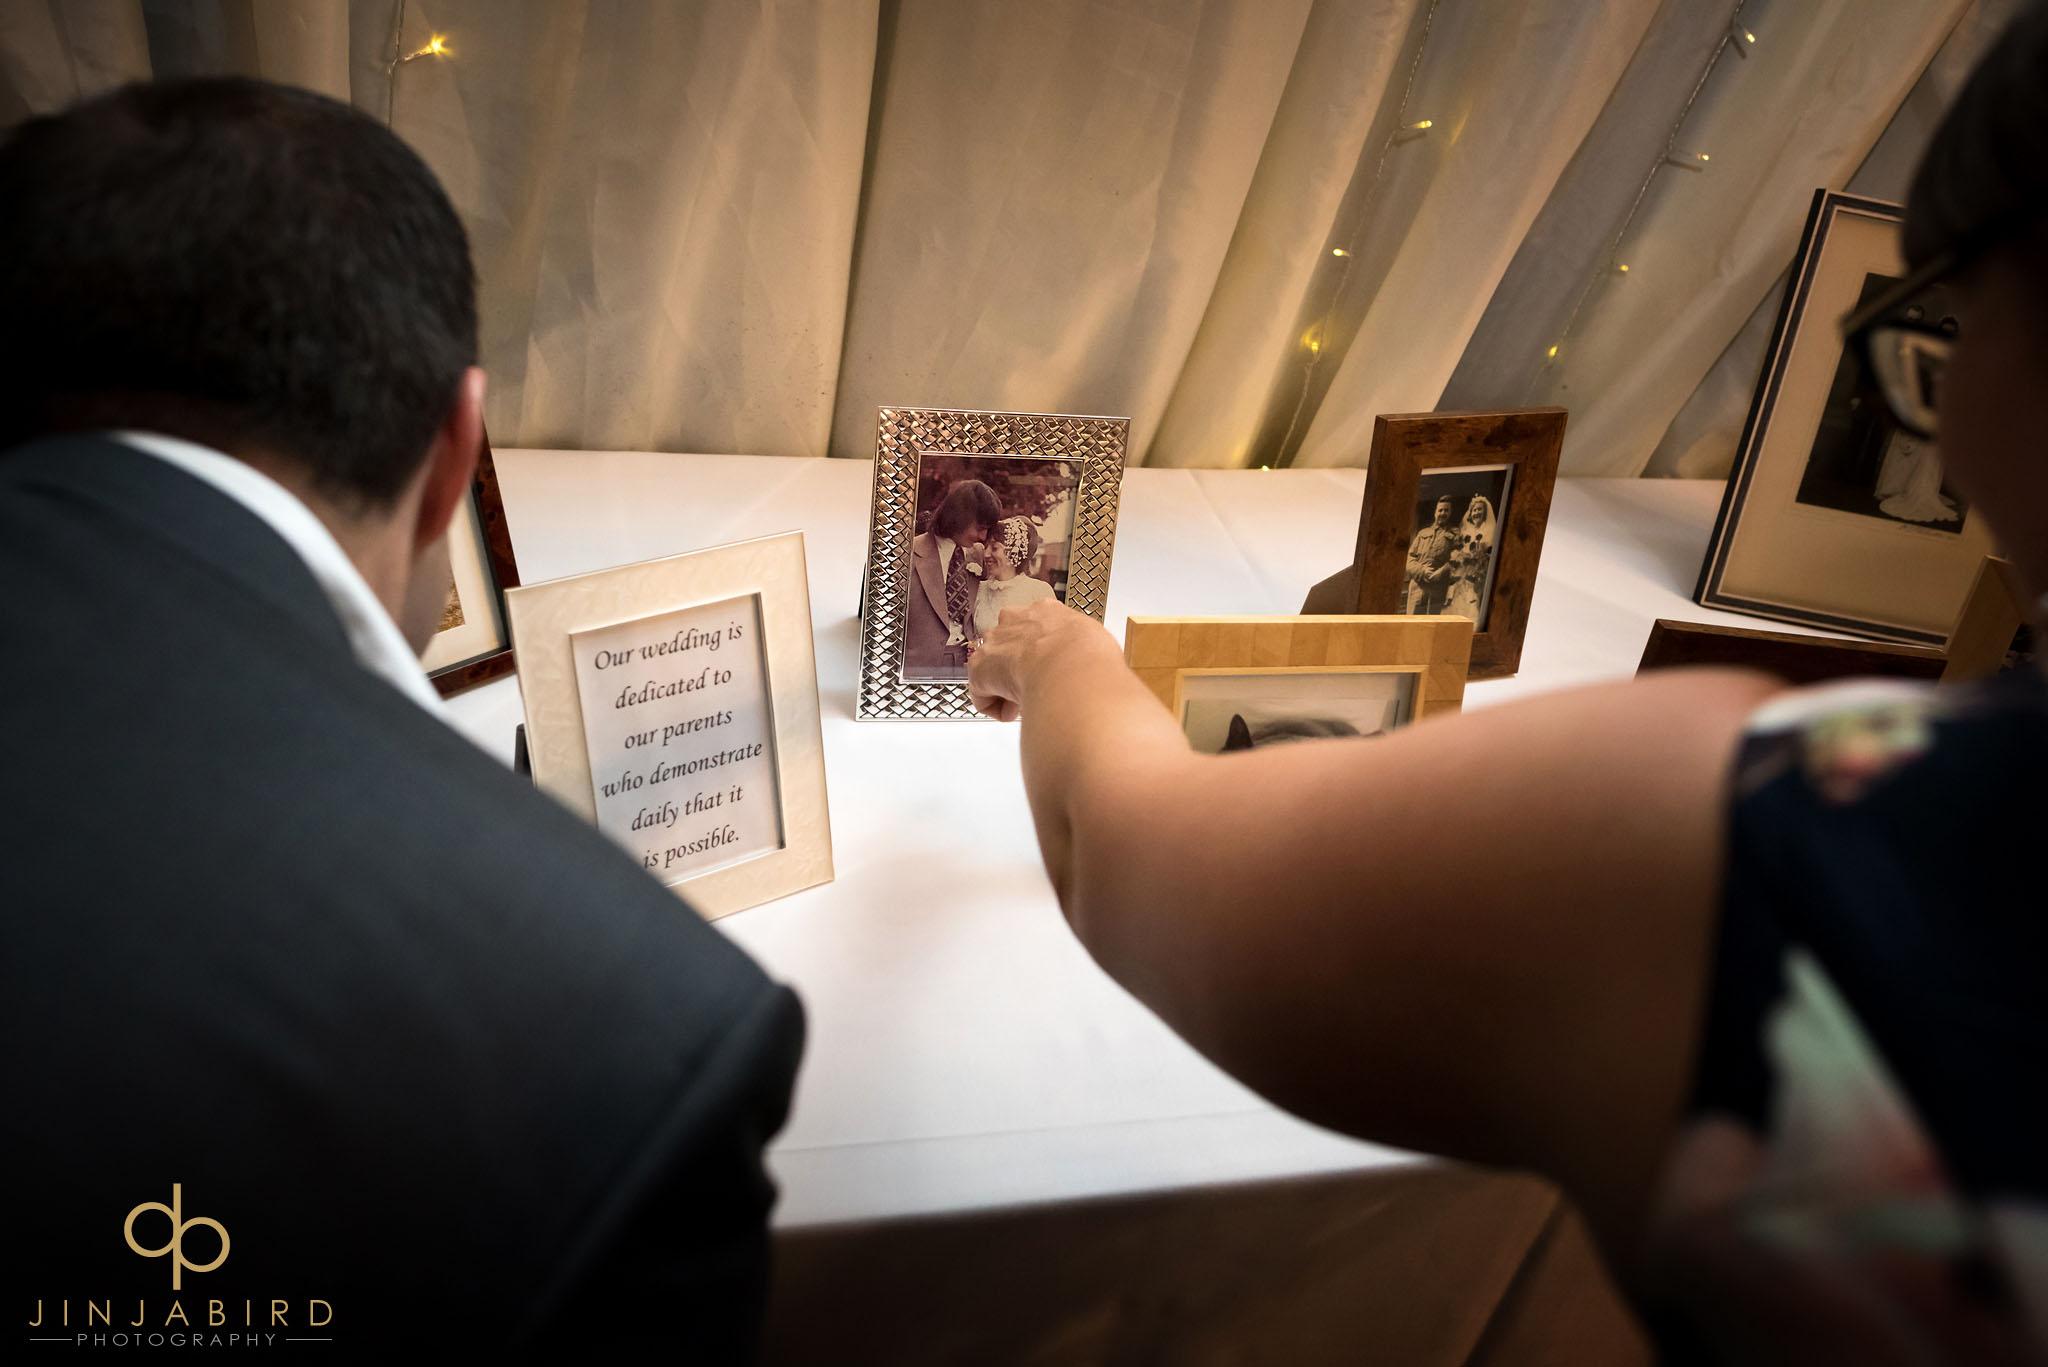 childerley hall wedding venue cambridge